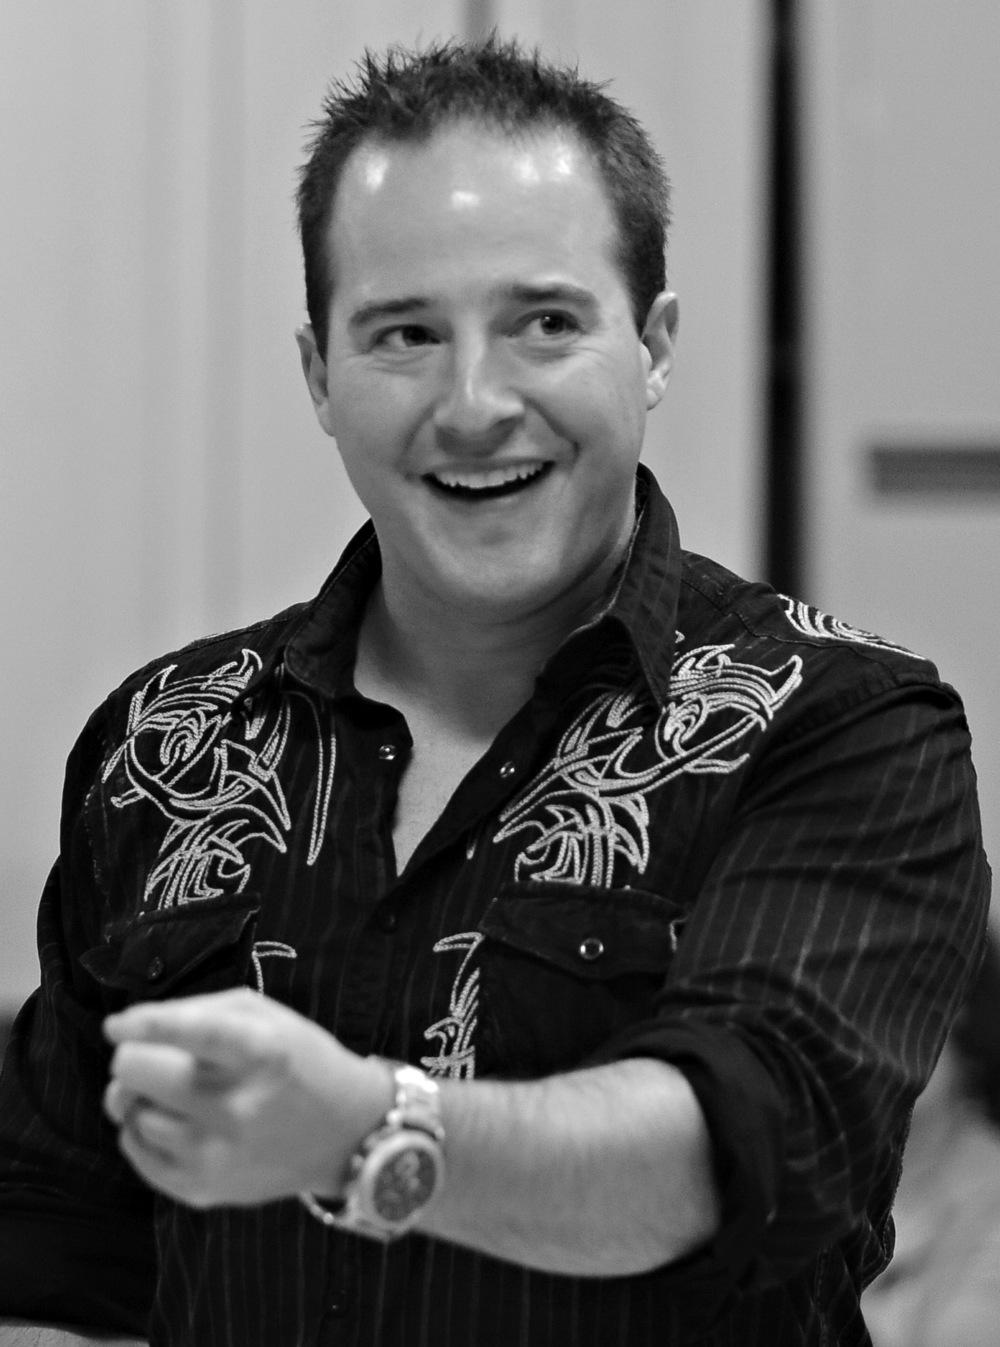 Jonny Moroni